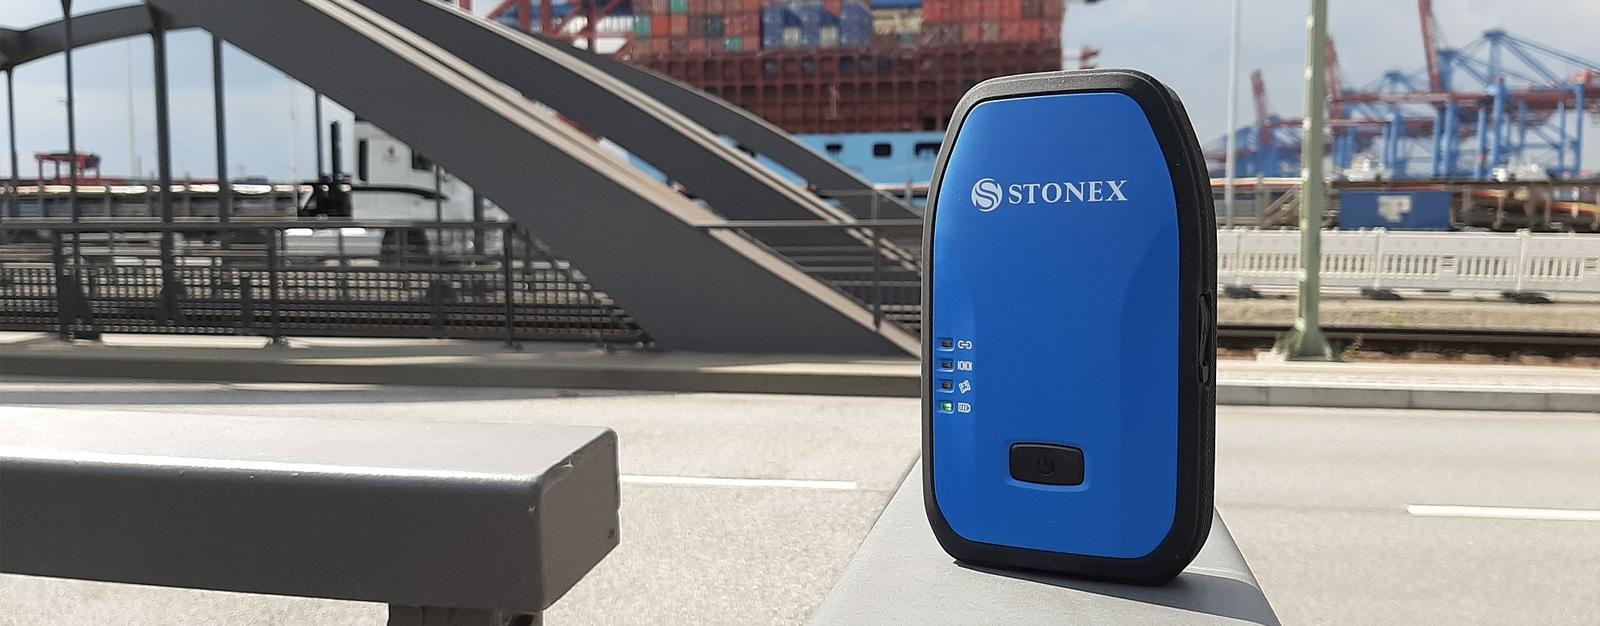 stonex-s500-gnss